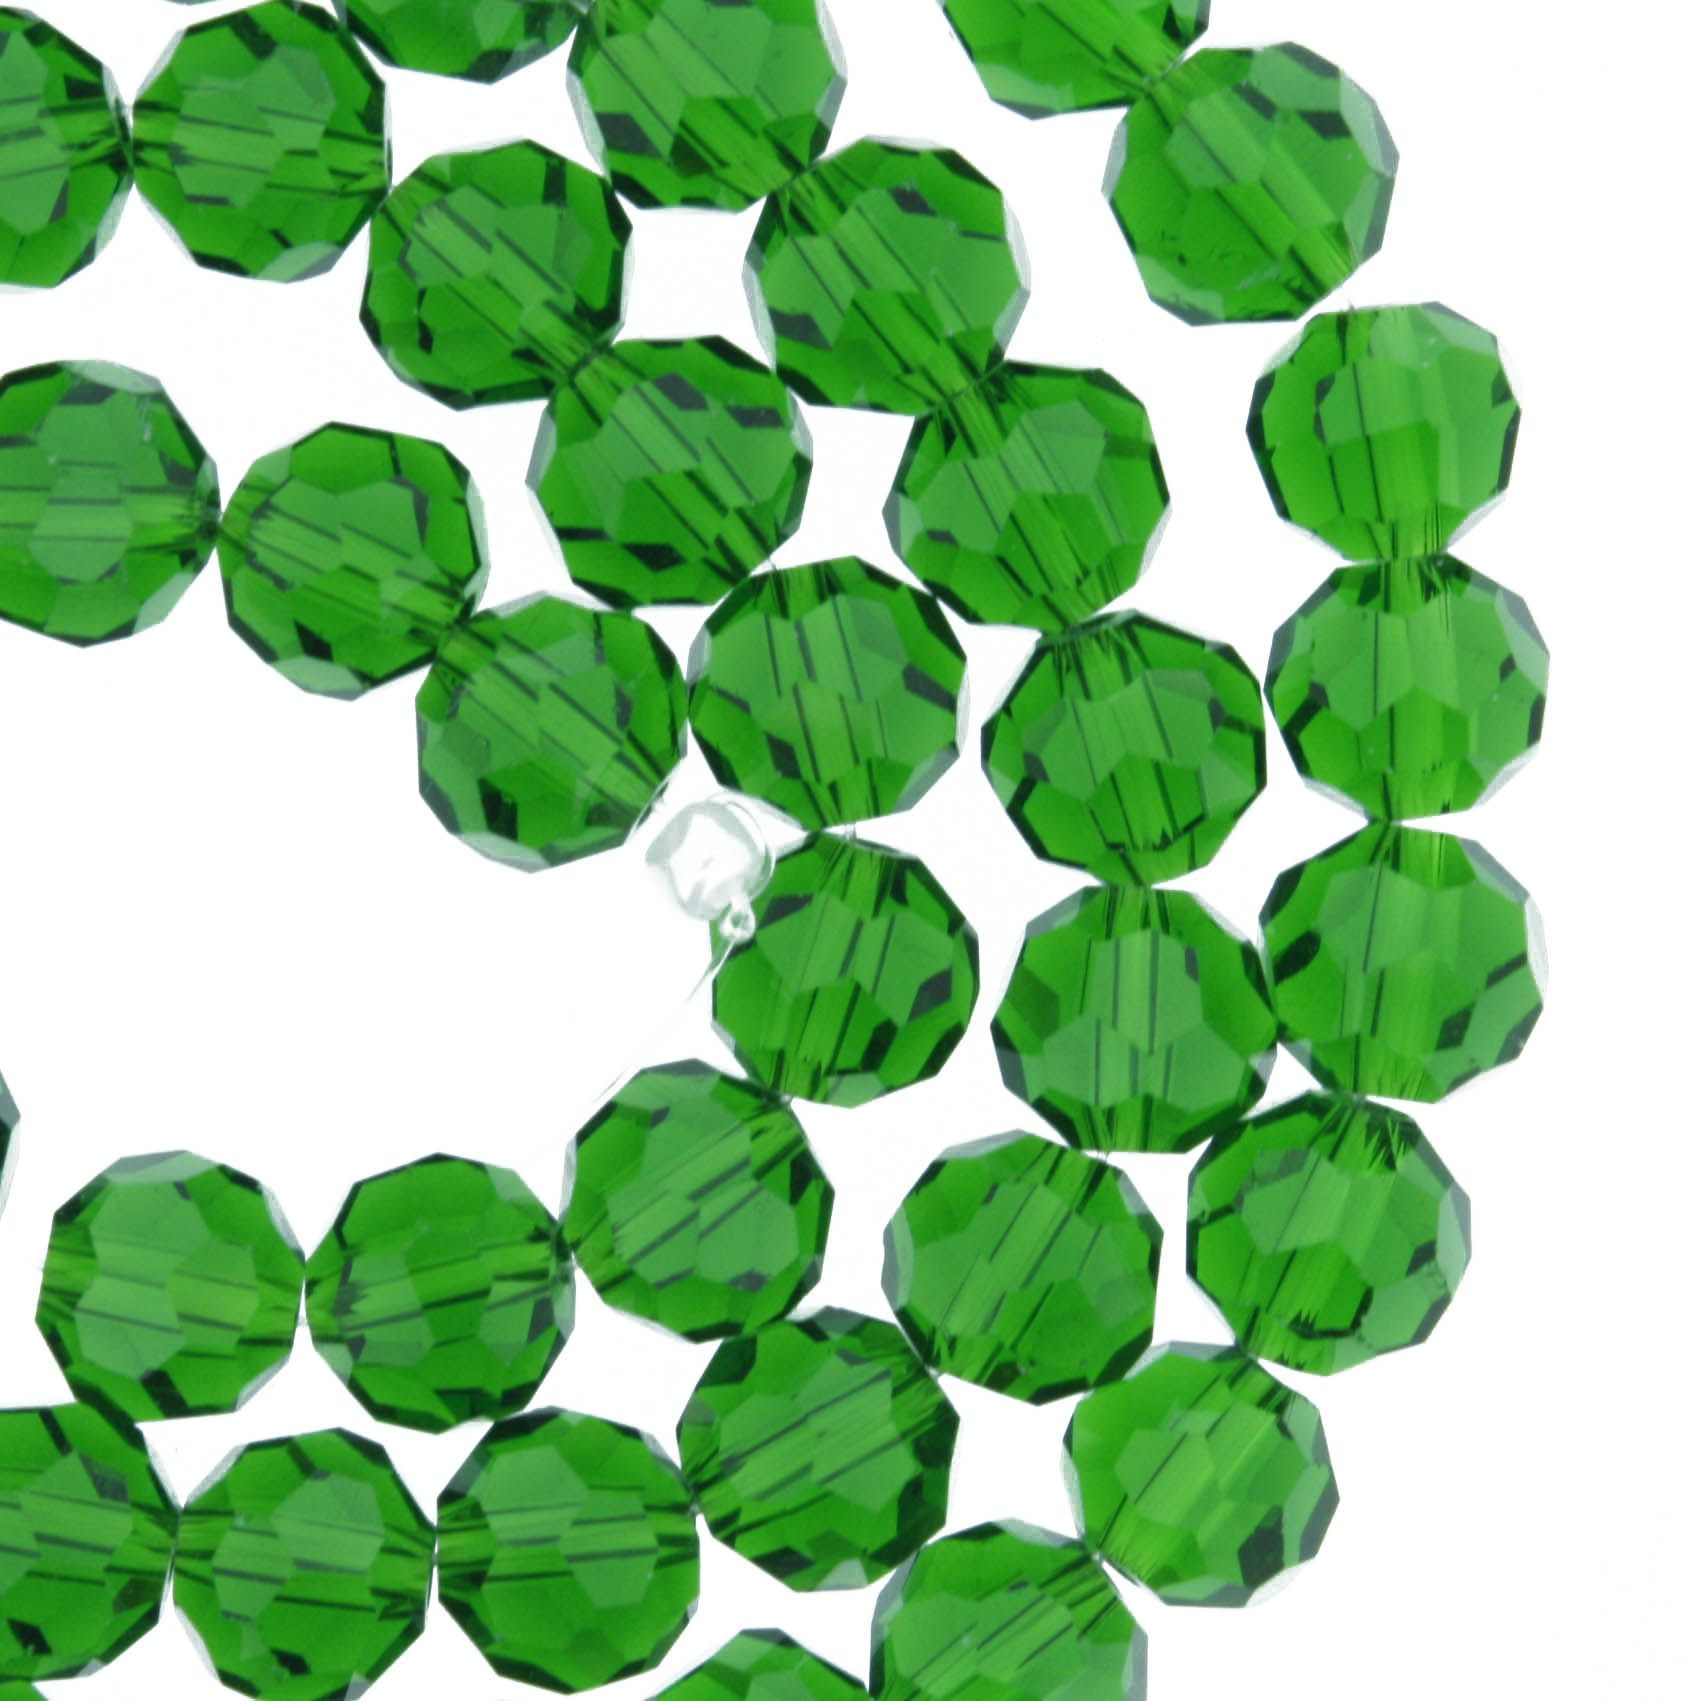 Fio de Cristal - Bello® - Verde Escuro Transparente - 8mm  - Universo Religioso® - Artigos de Umbanda e Candomblé